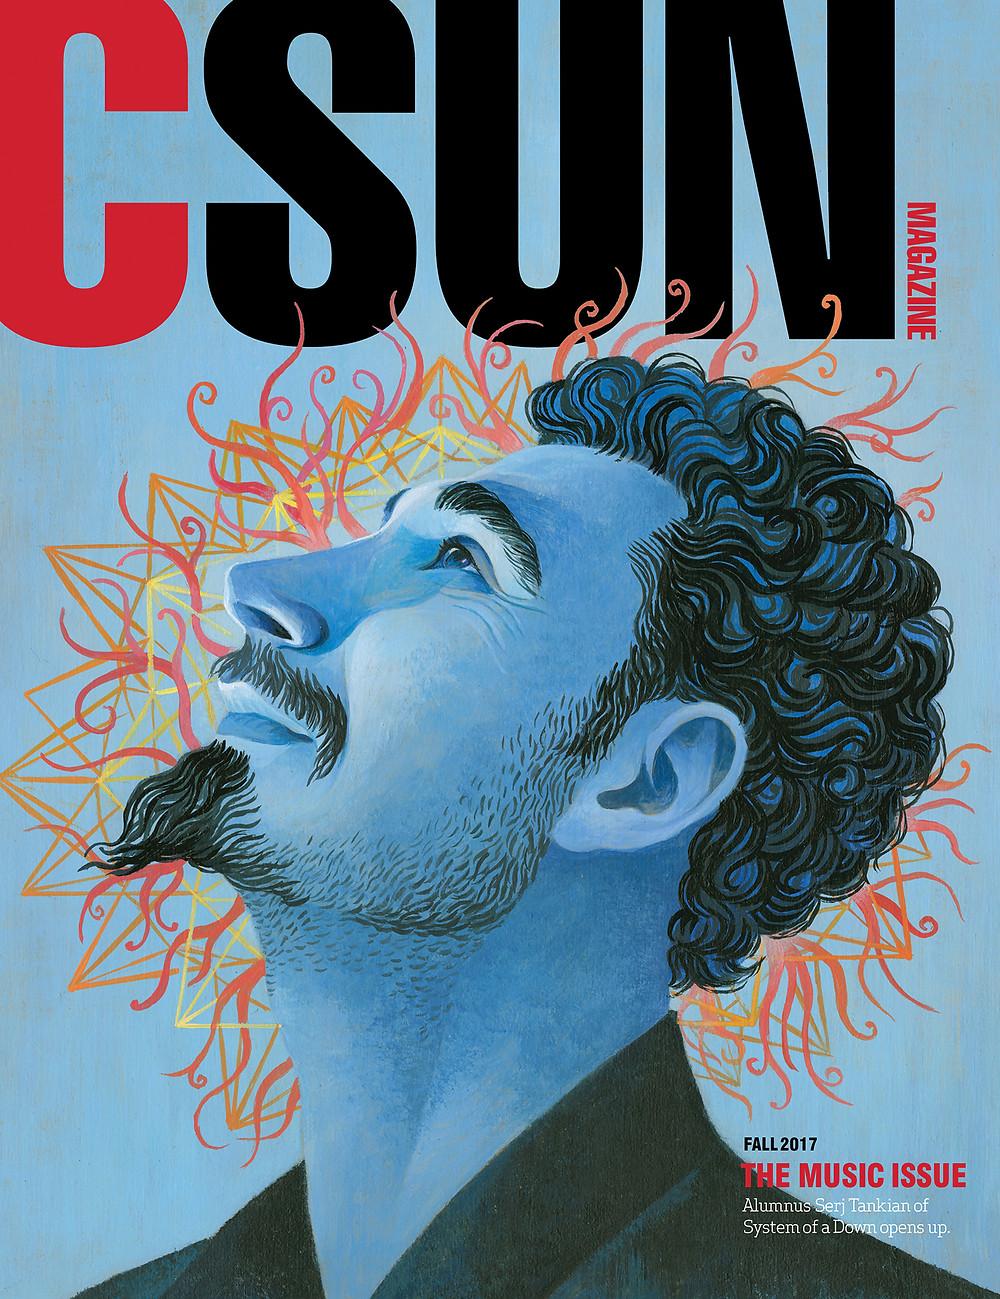 "CSUN,""The Music Issue"""